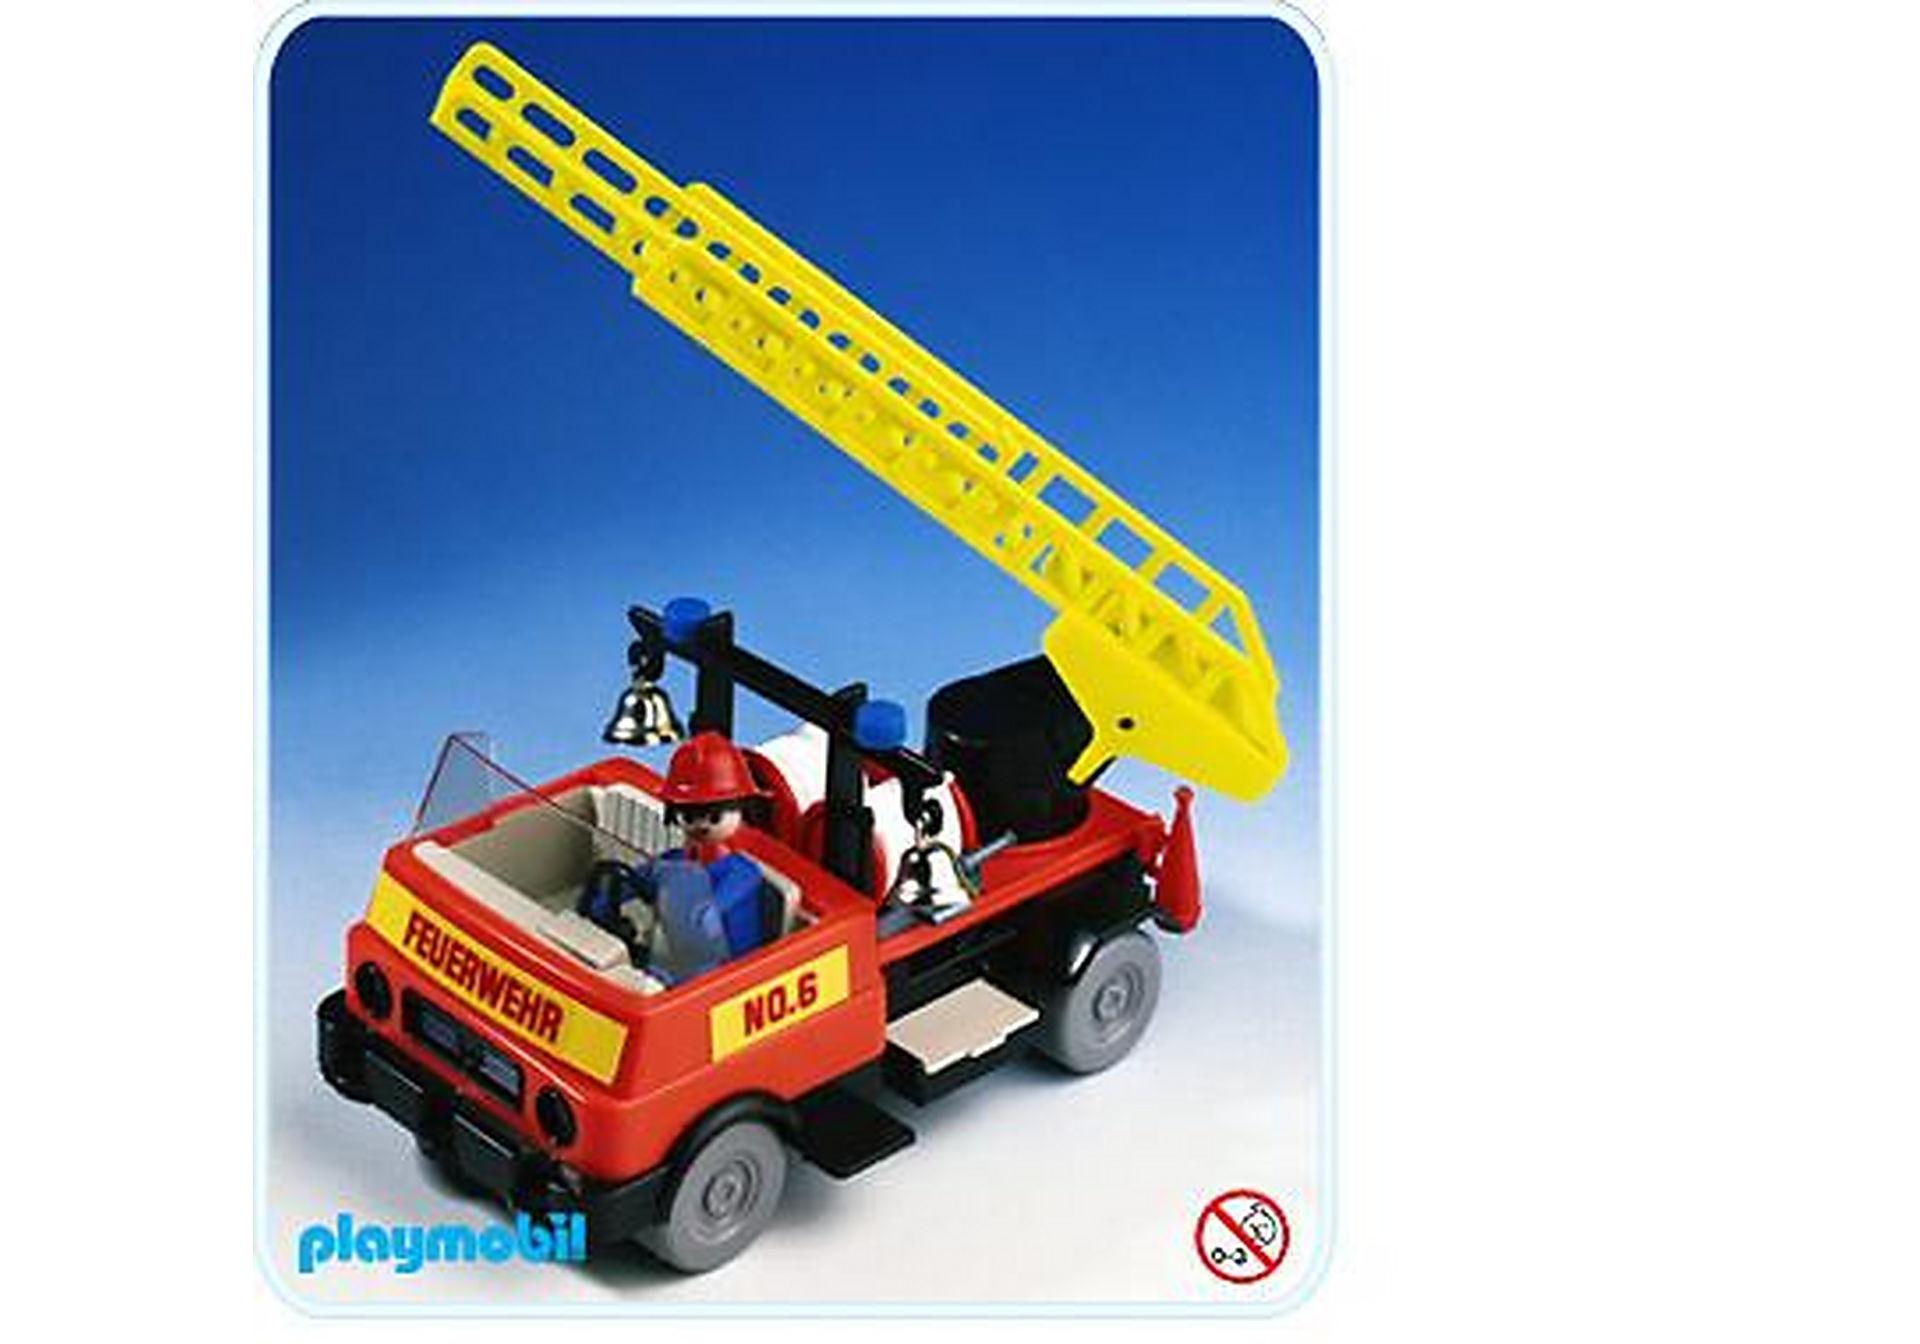 3236-B Feuerwehrauto zoom image1